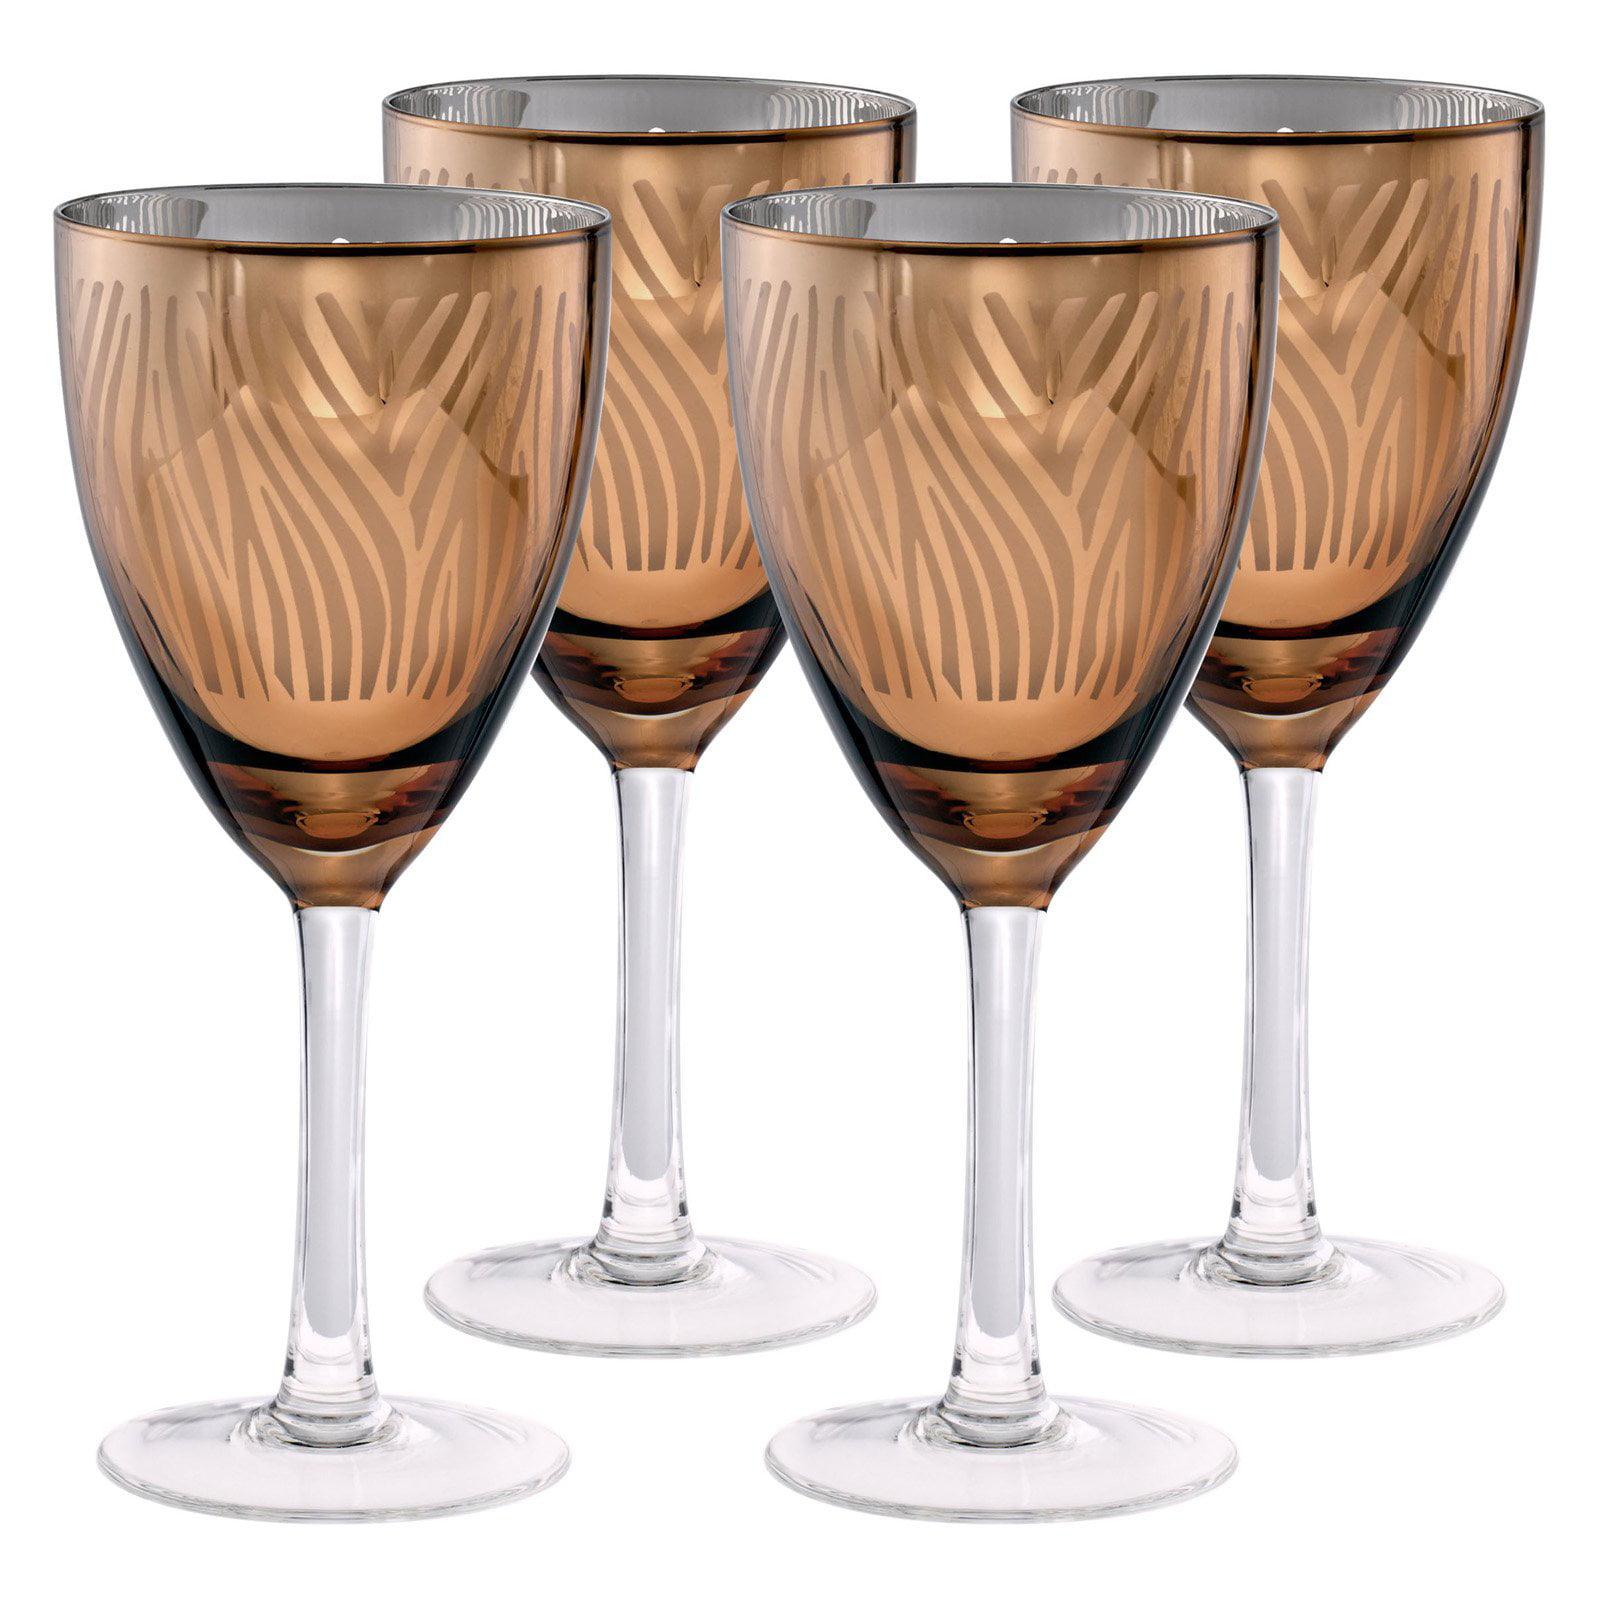 Artland Inc. Zebra Gold Wine Glasses Set of 4 by Artland